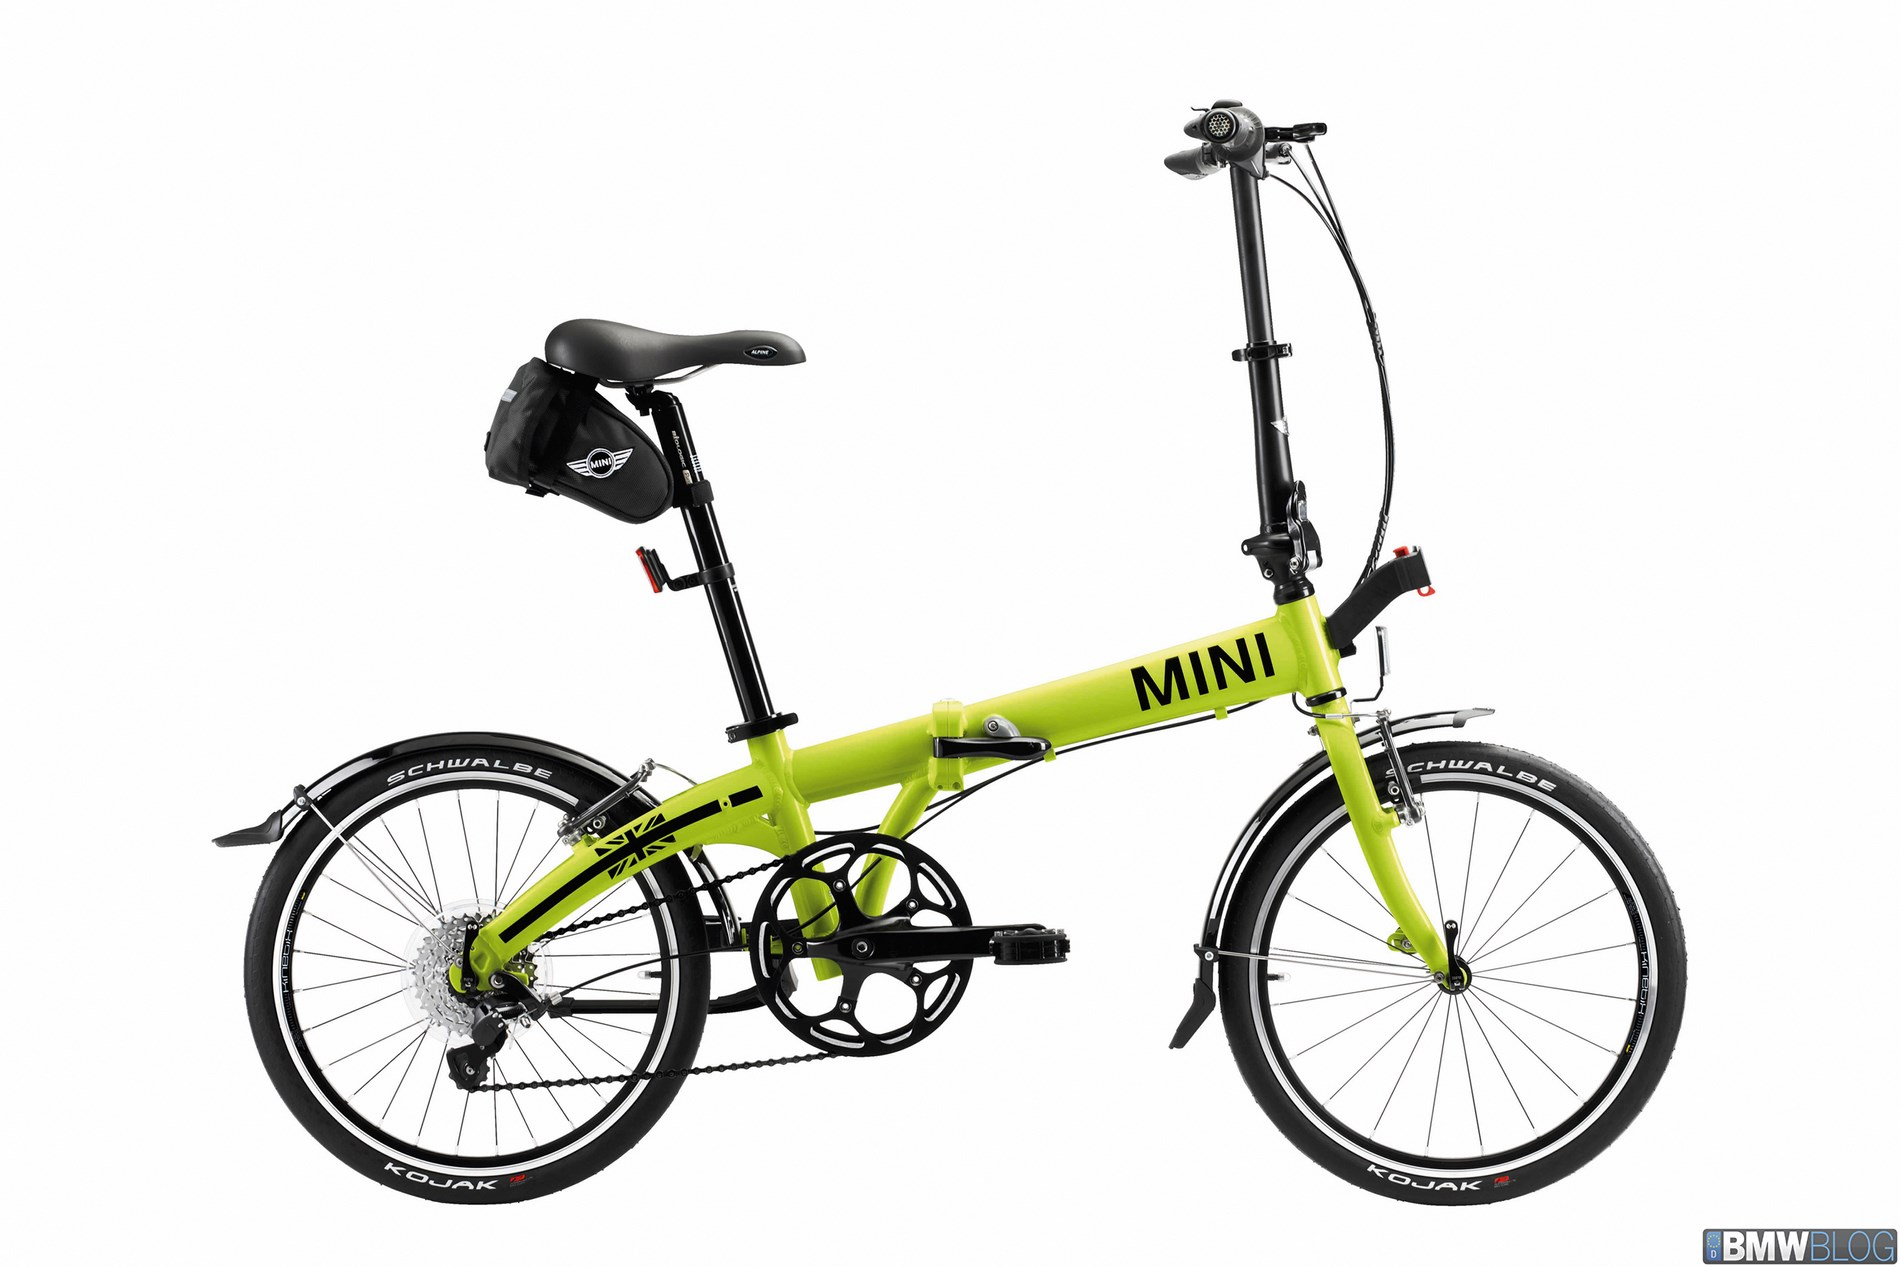 mini folding bike 09